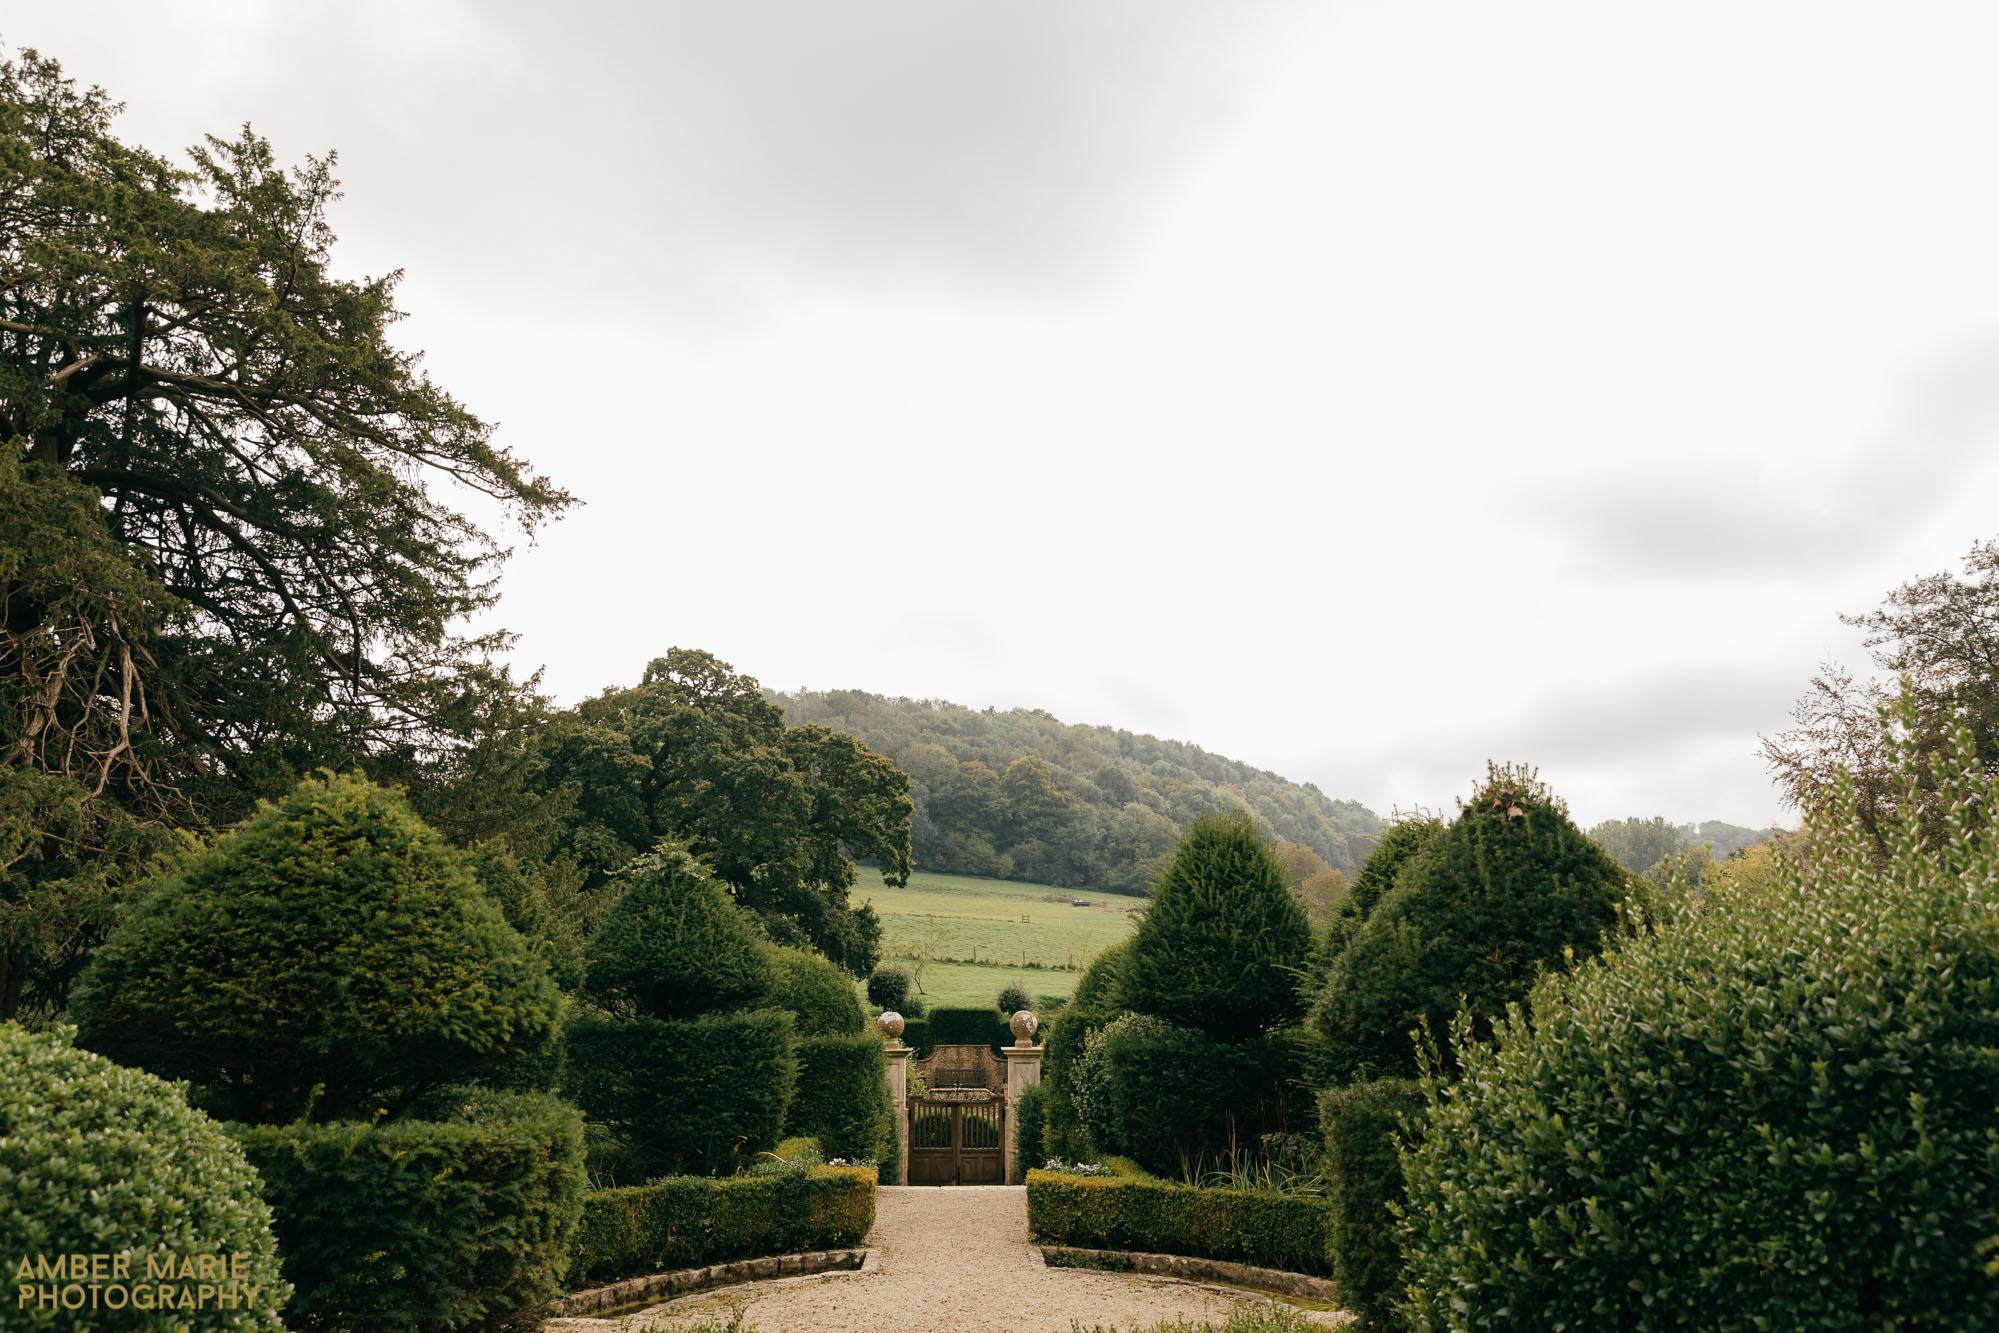 owlpen manor Uley